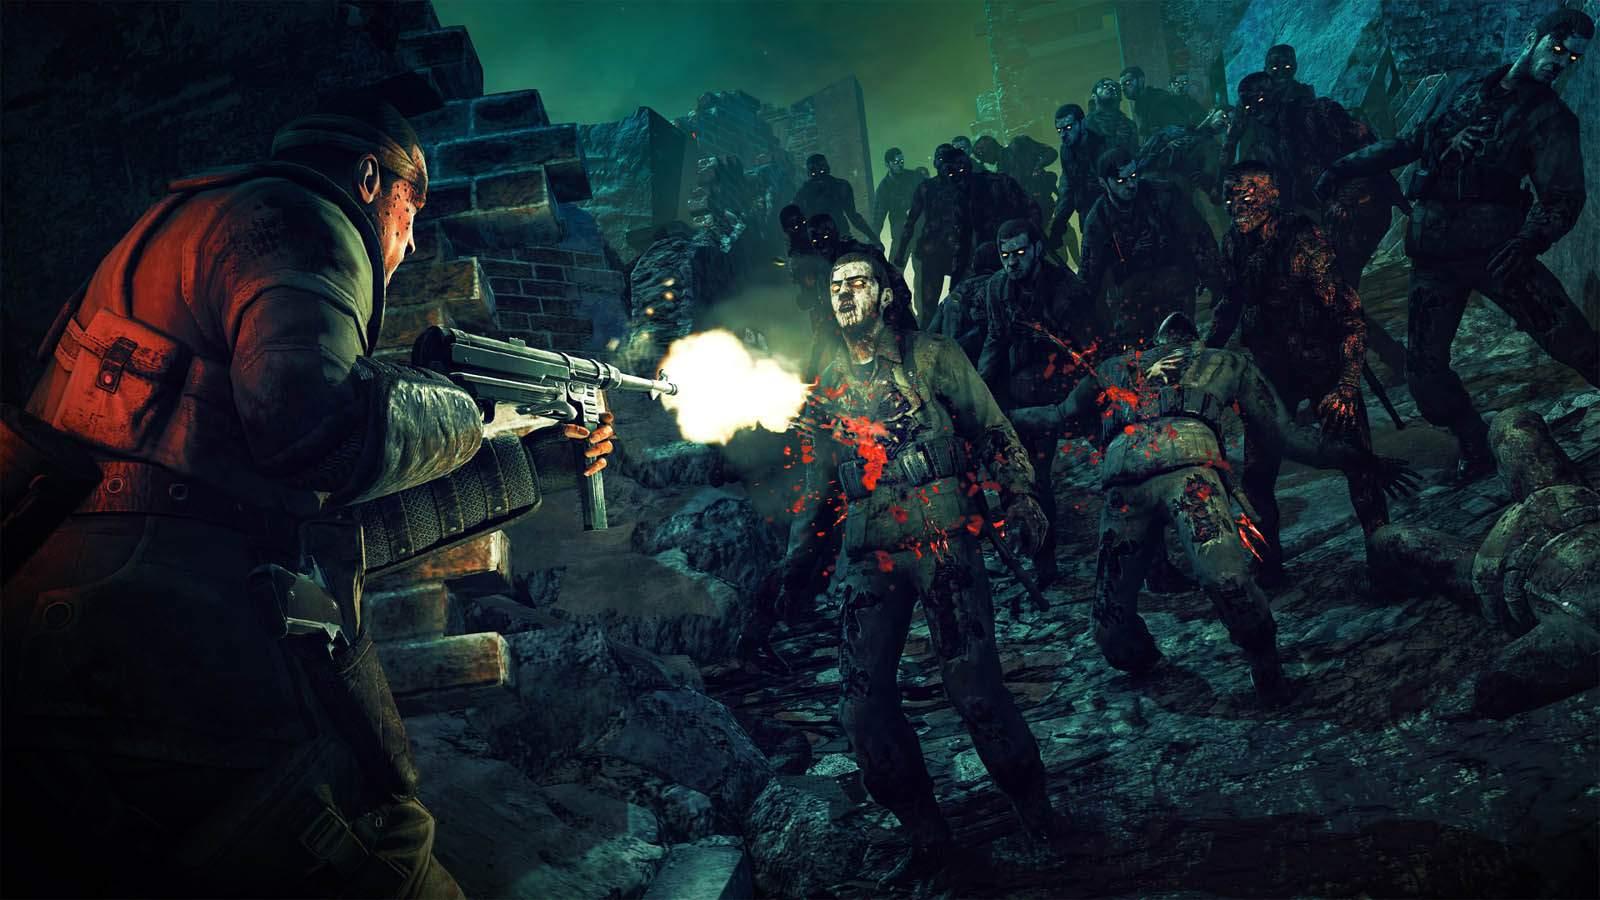 تحميل لعبة Zombie Army Trilogy مضغوطة برابط واحد مباشر كاملة مجانا